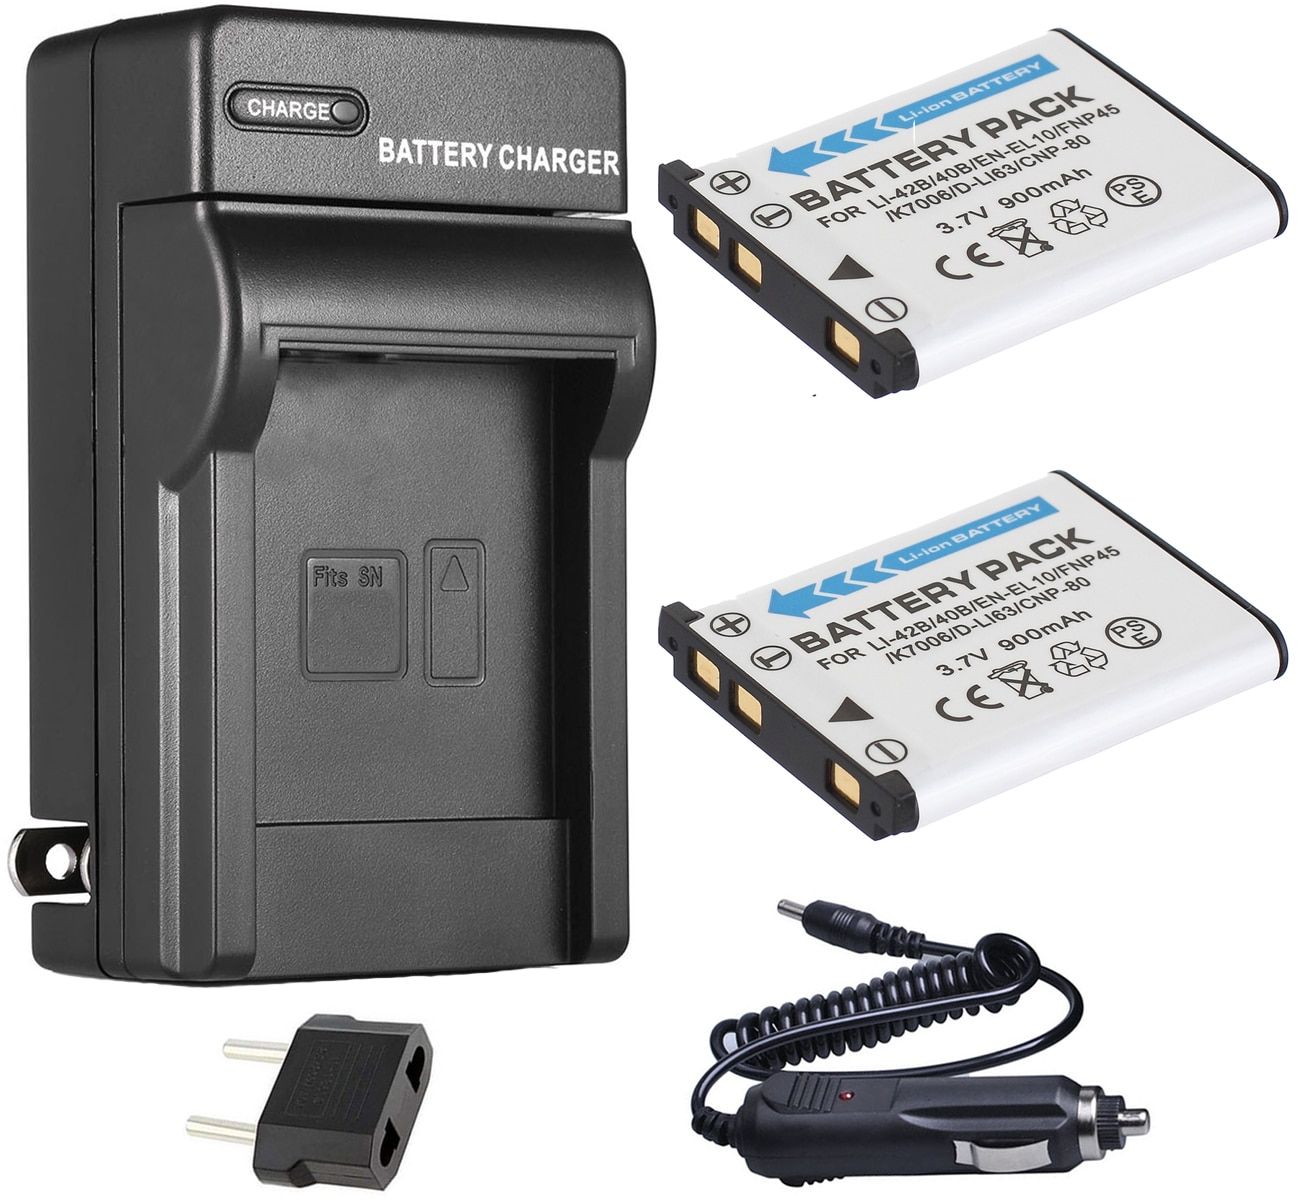 Bateria (2 pacotes) + carregador para olympus stylus VG-165, VG-180, 550wp, X-560WP, d630, d720, d725, d730, d765, d770 câmera digital